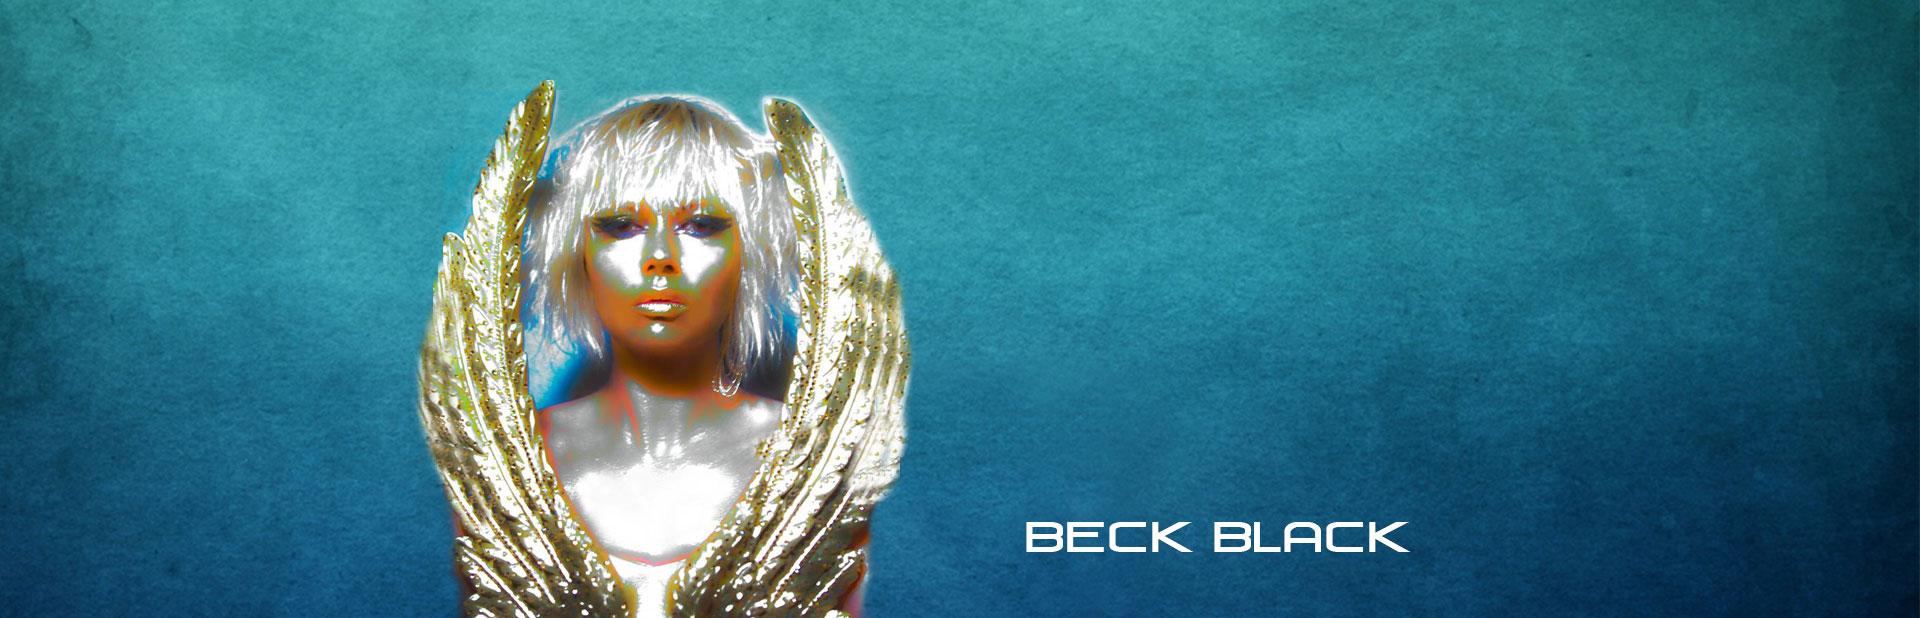 Beck Black